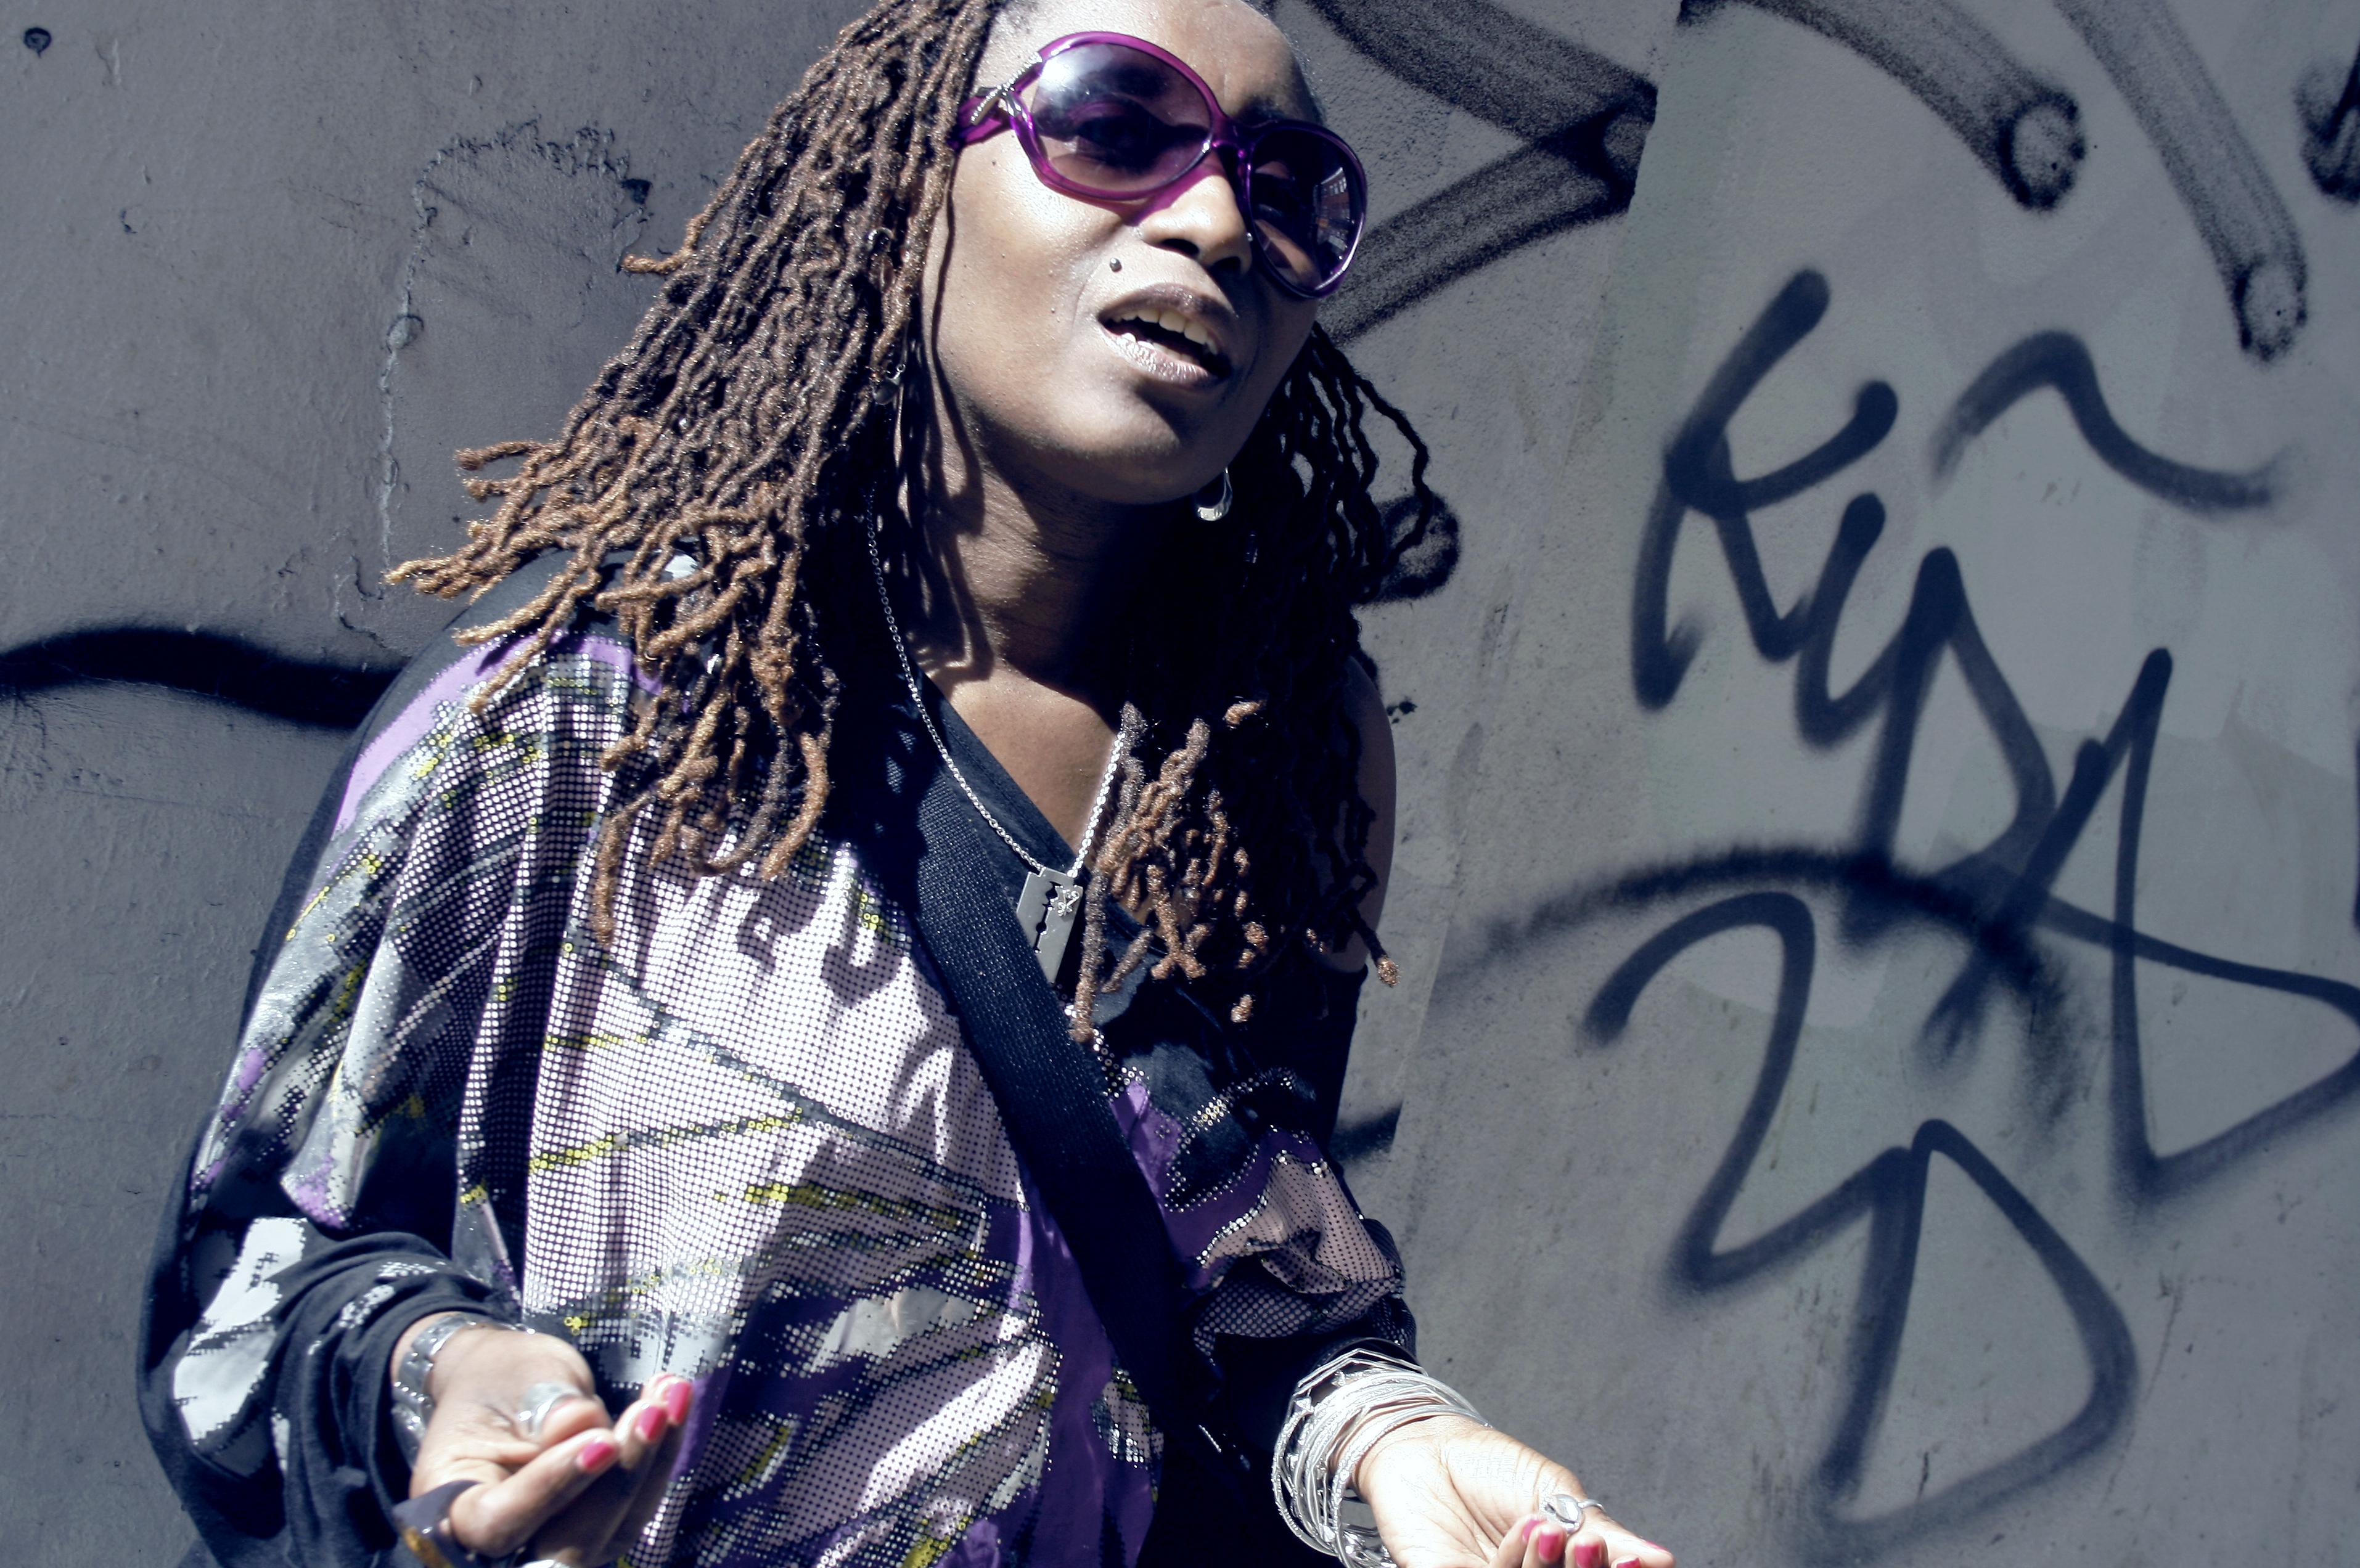 Spoken+Word+artist+-+Malika+Booker+3.jpg